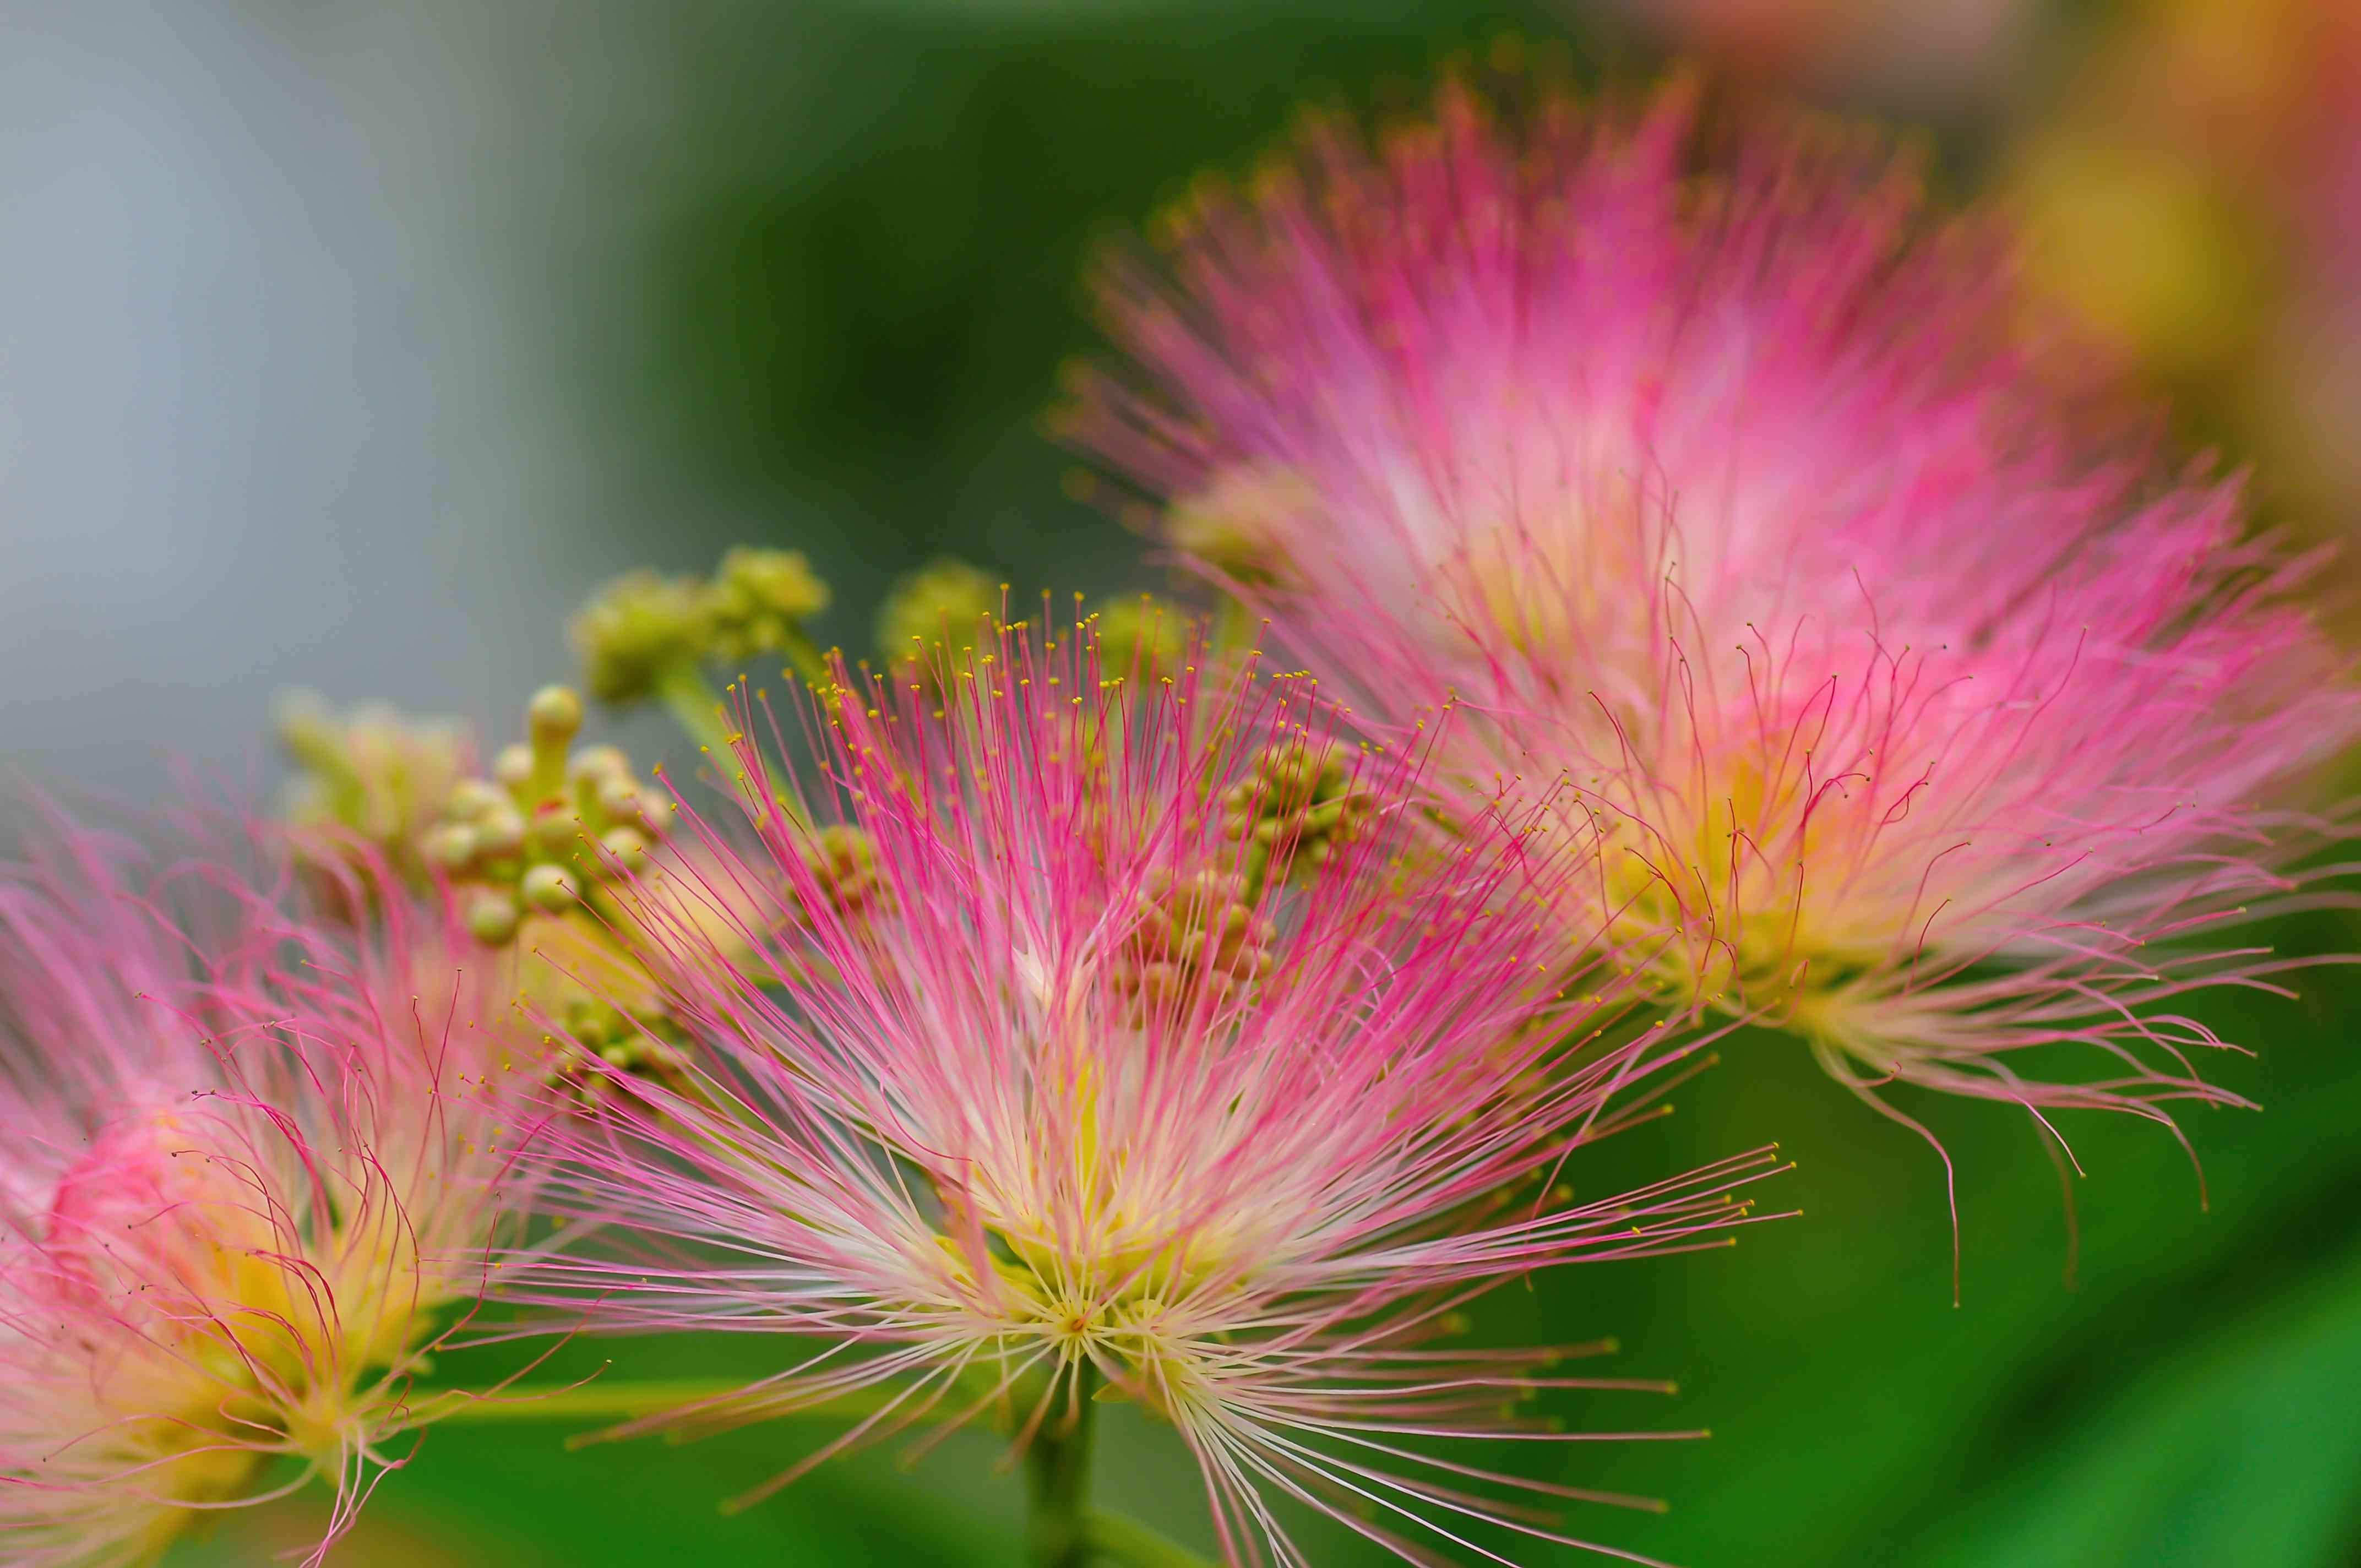 beautiful pink inflorescences of Albizia julibrissin